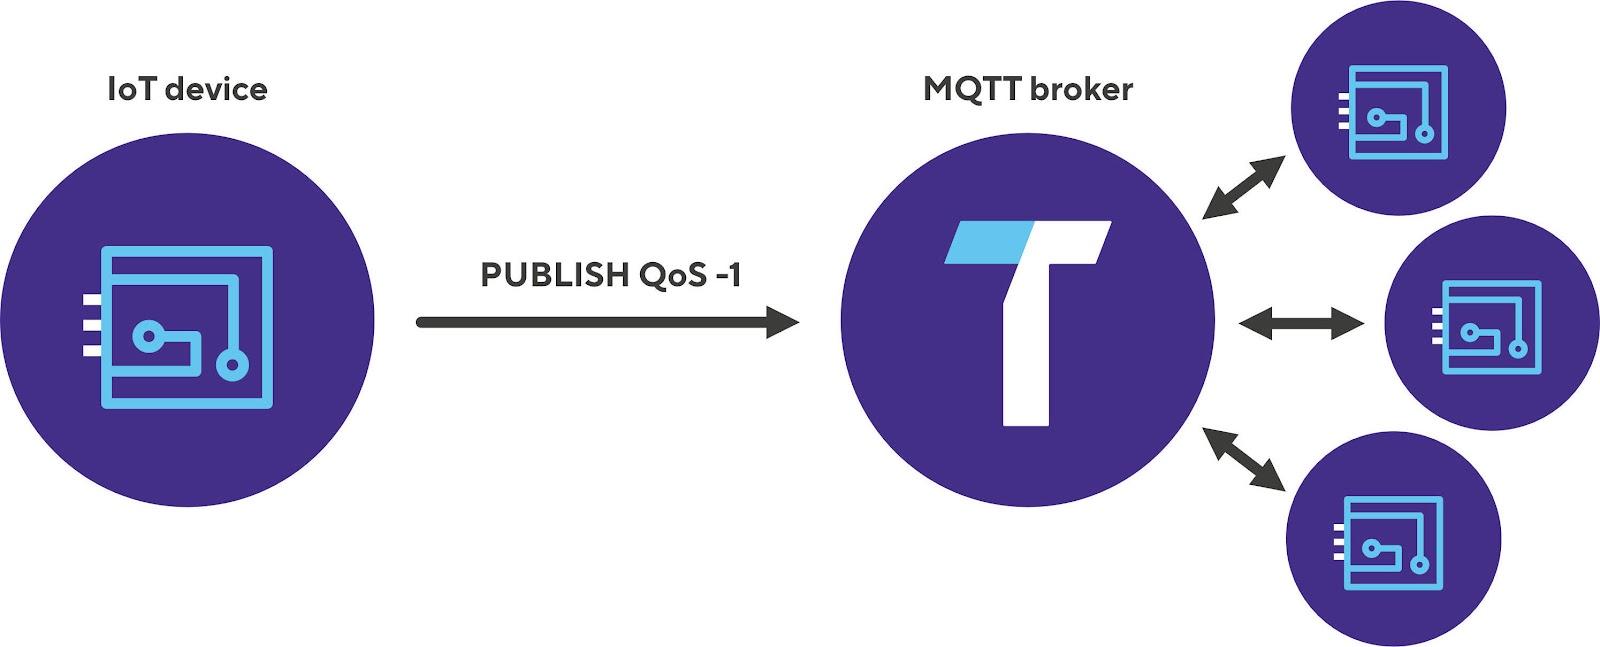 MQTT QoS -1